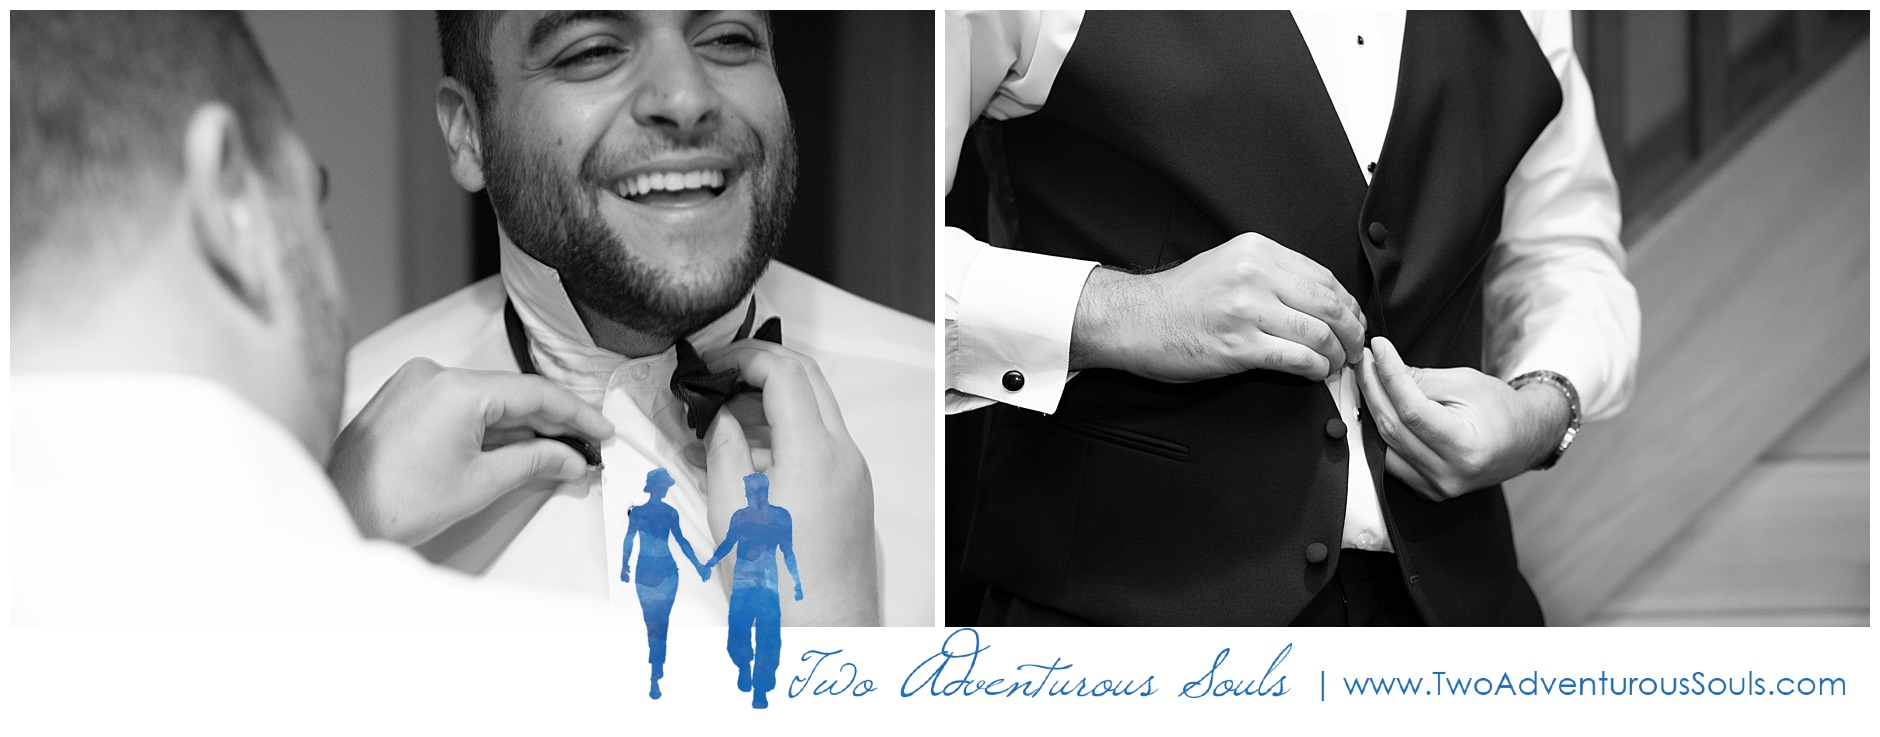 Sugarloaf Outdoor Center Wedding Photographers, Destination Wedding Photographers, Two Adventurous Souls-081719_0008.jpg